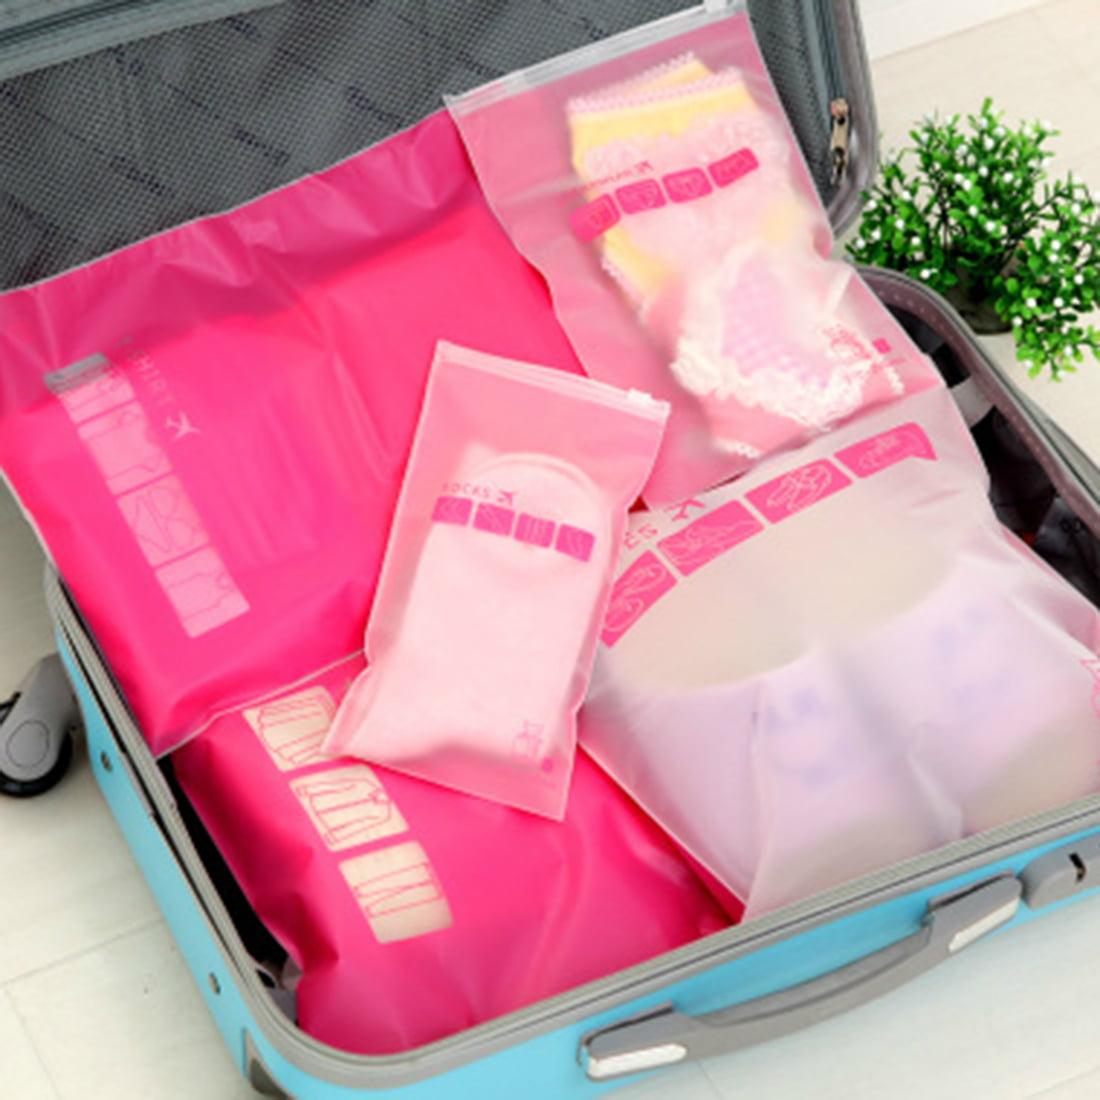 Plastic Water Resistant Travel Clothes Underwear Storage Bag 28x40cm Fuchsia - image 5 de 8